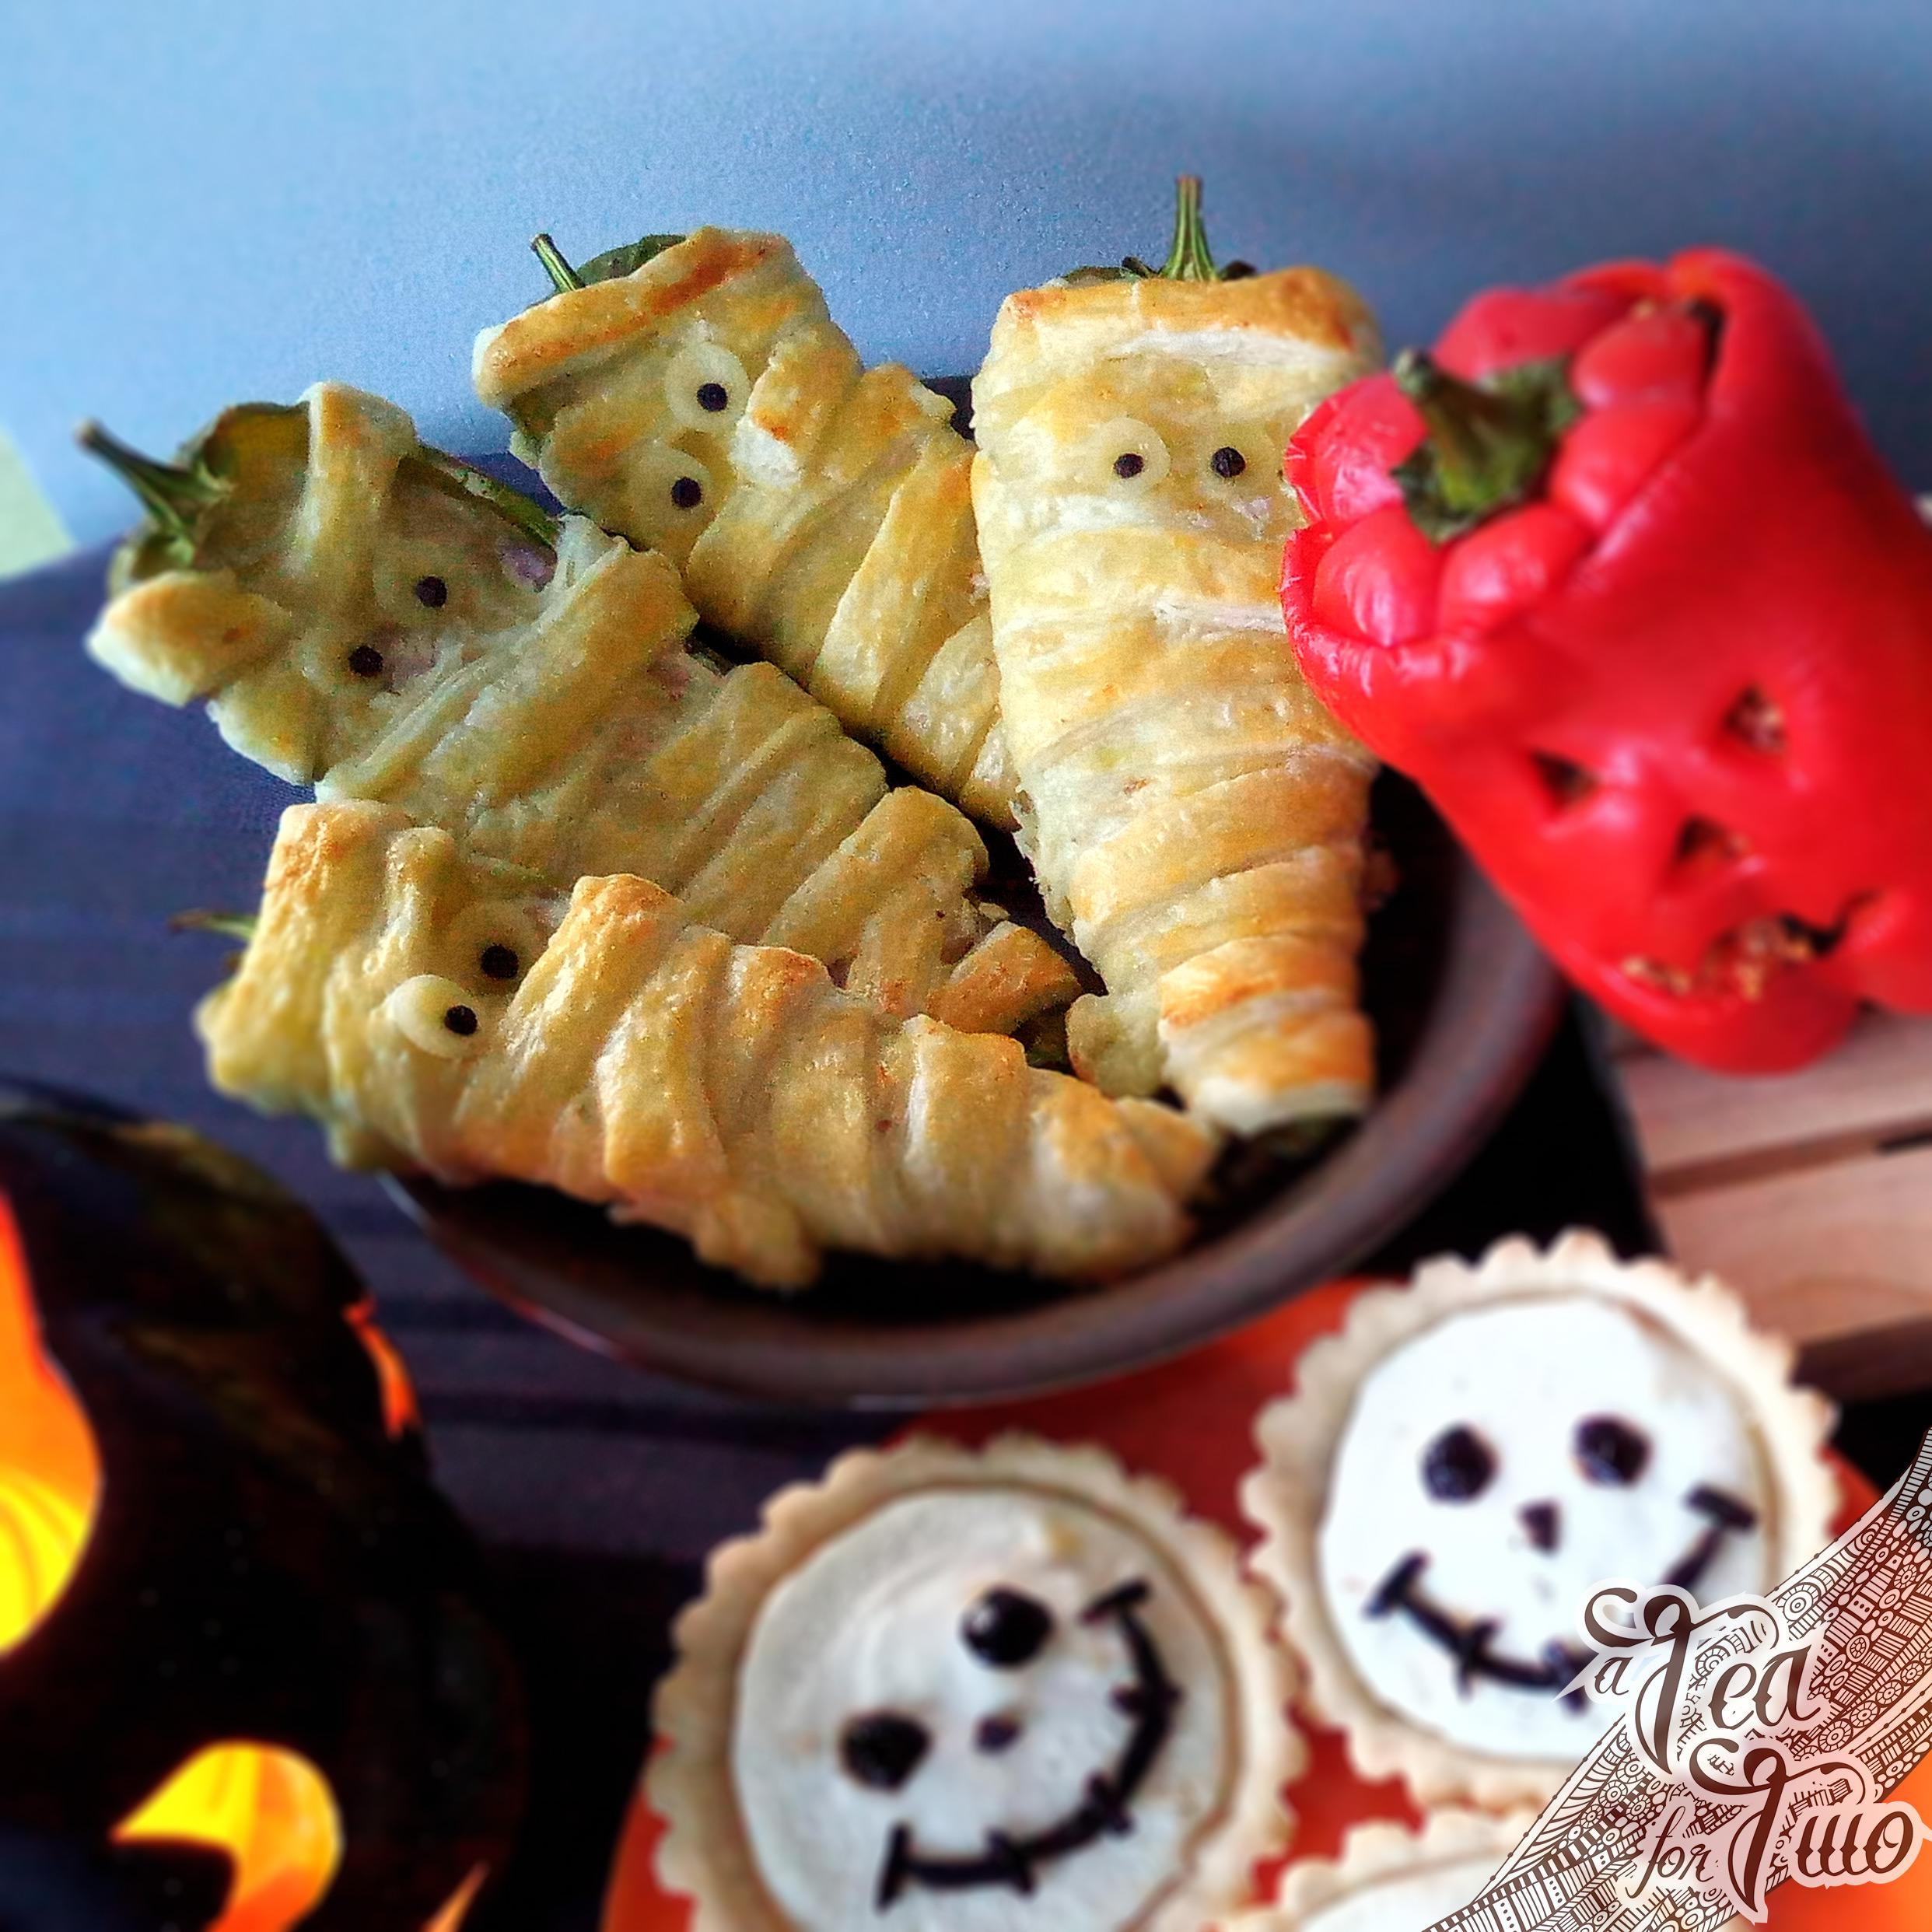 Peperoni mummificati al formaggio